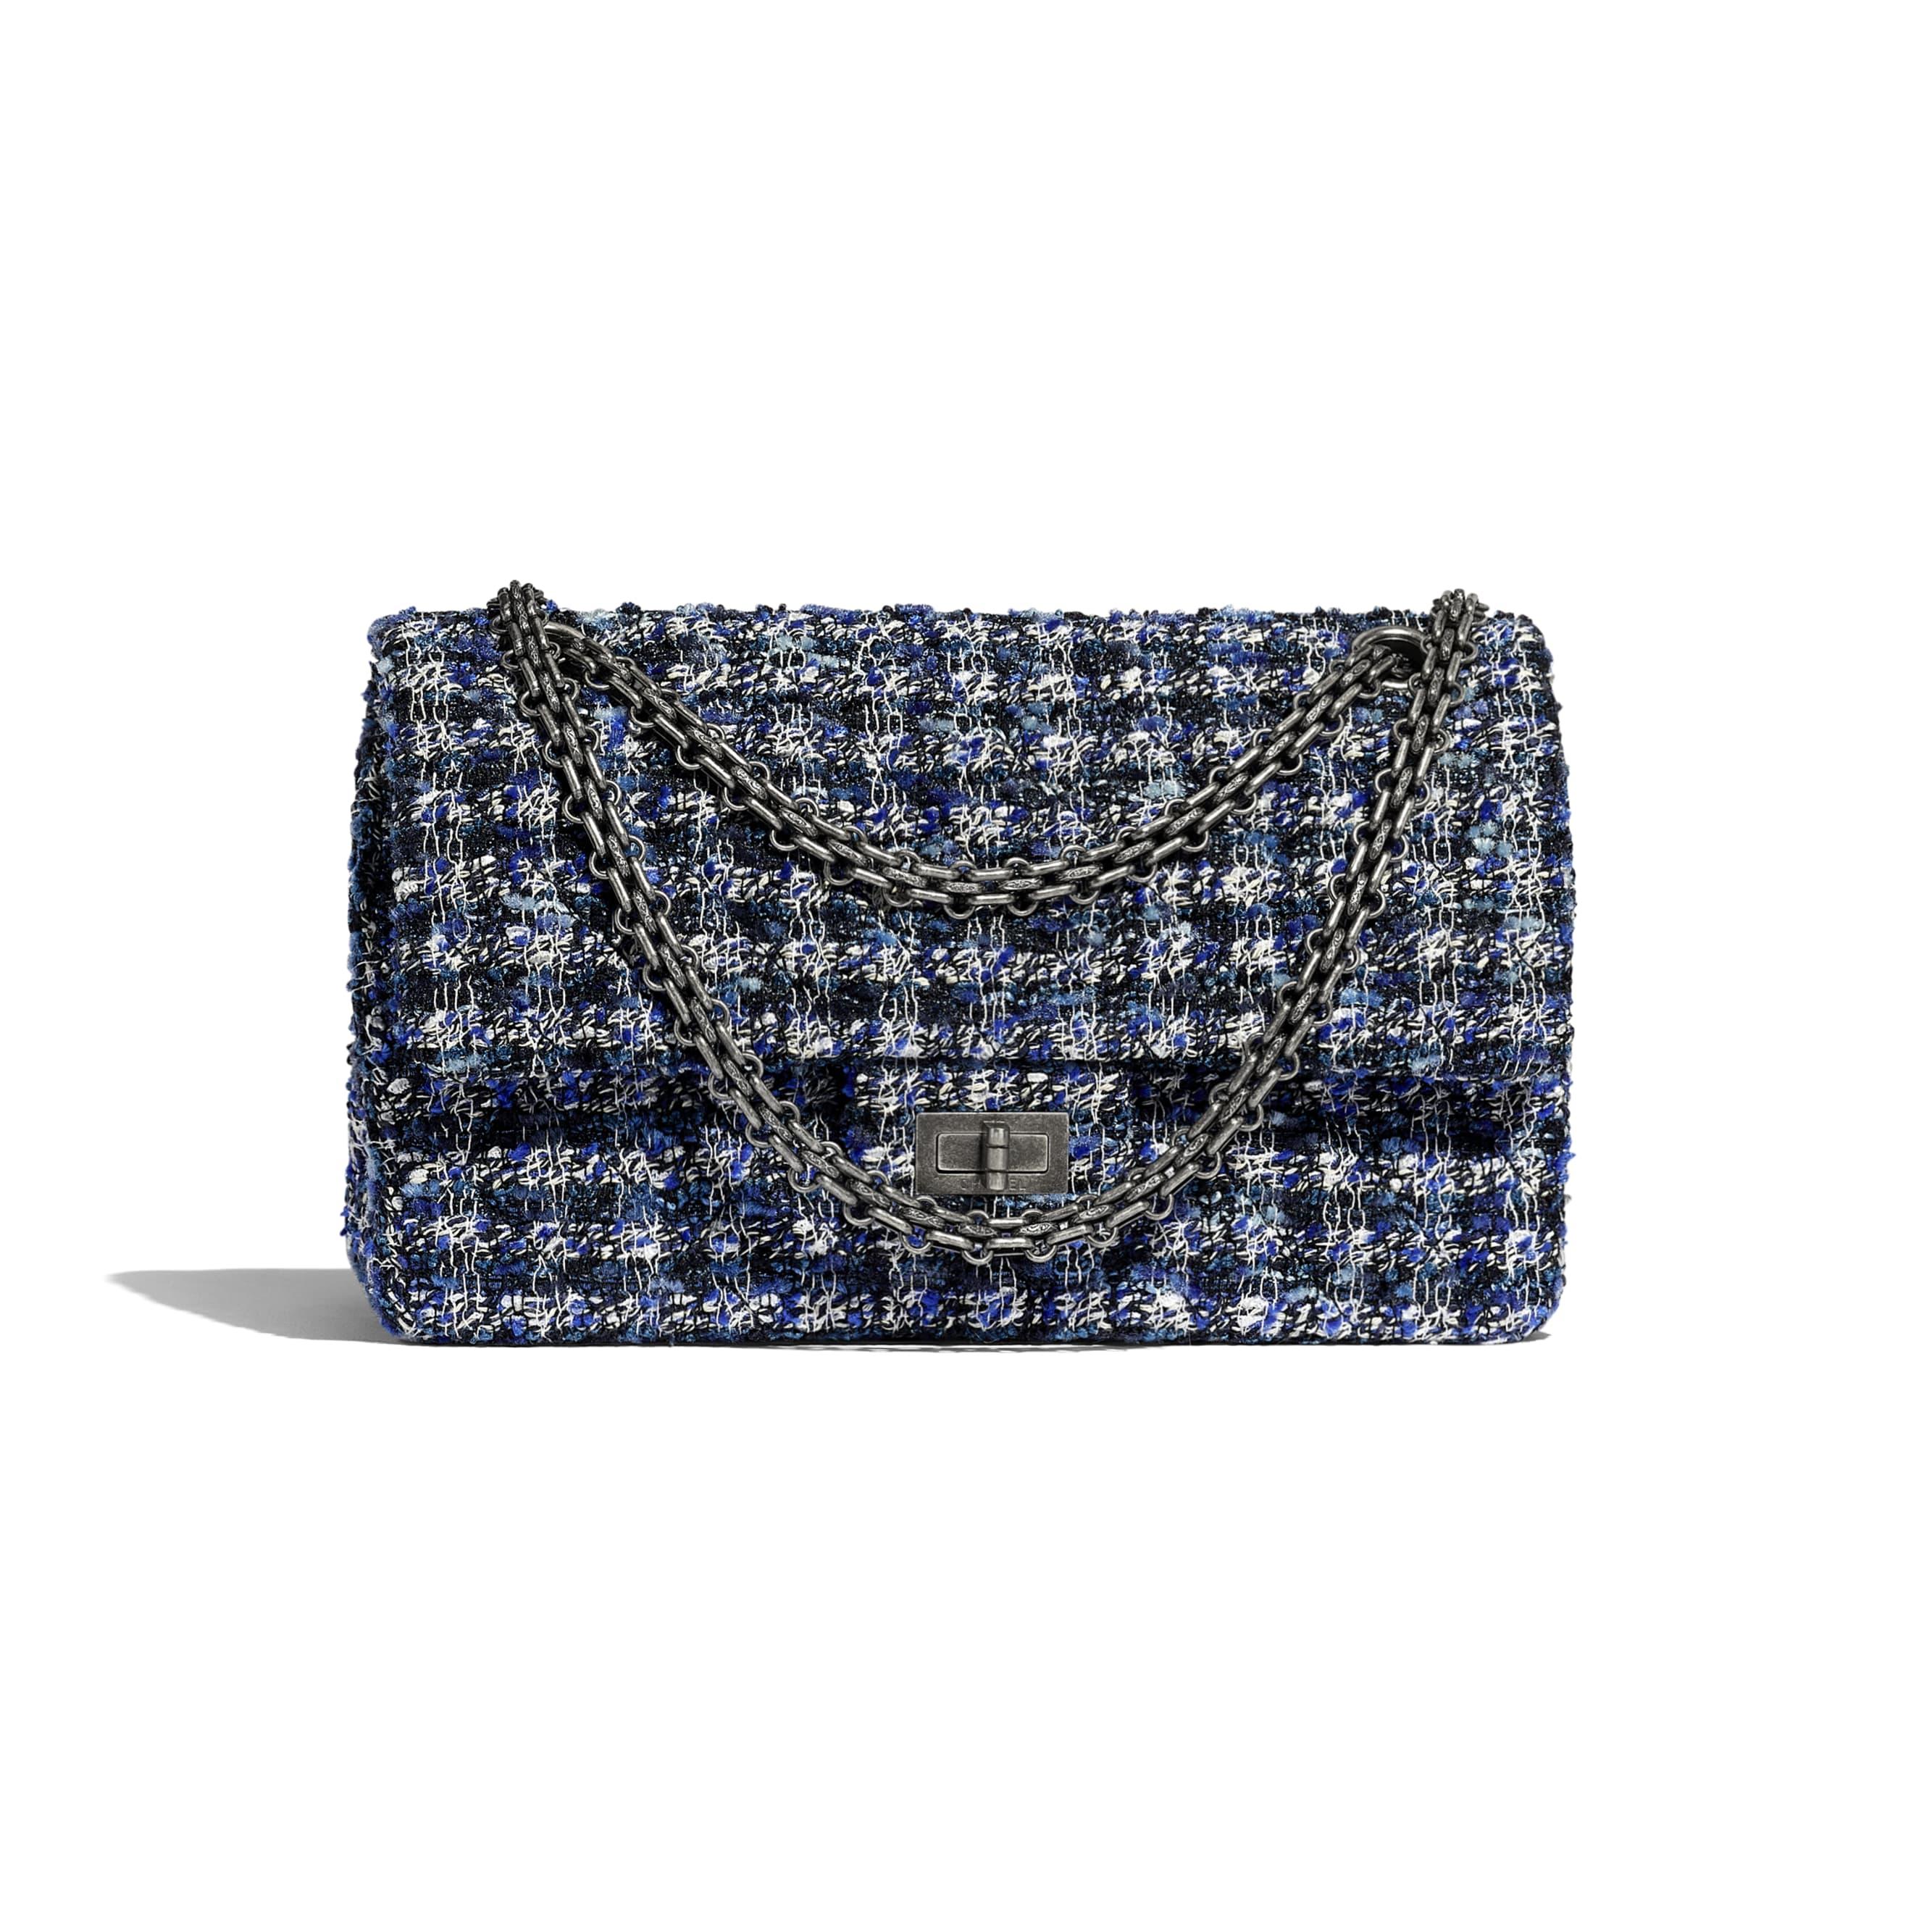 2.55 Handbag - Navy Blue, Blue, Ecru & Black - Tweed & Ruthenium-Finish Metal - CHANEL - Default view - see standard sized version